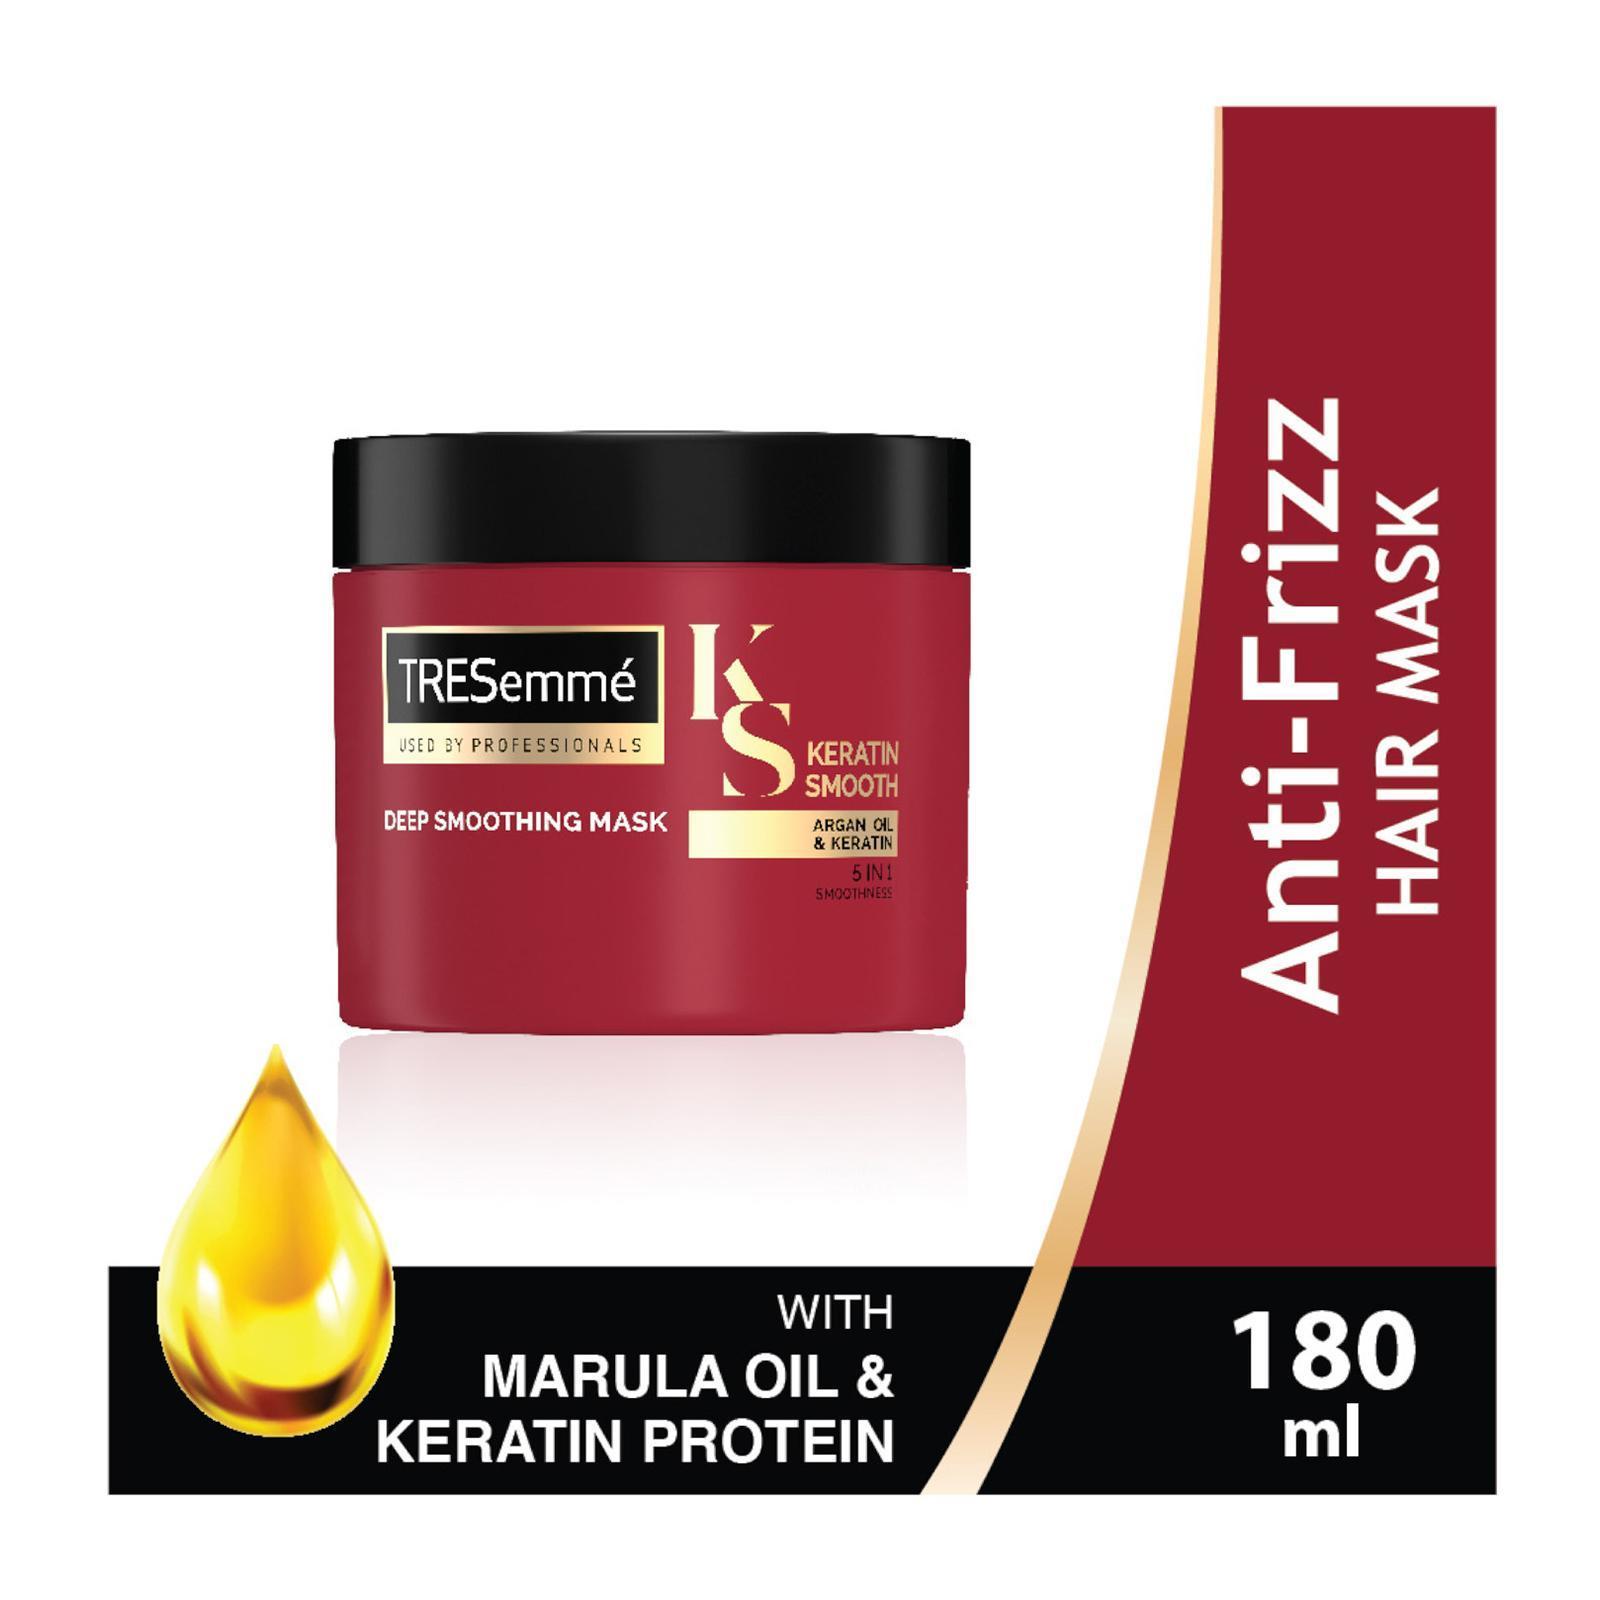 TRESEMME keratin smooth anti frizz hair mask 180ml